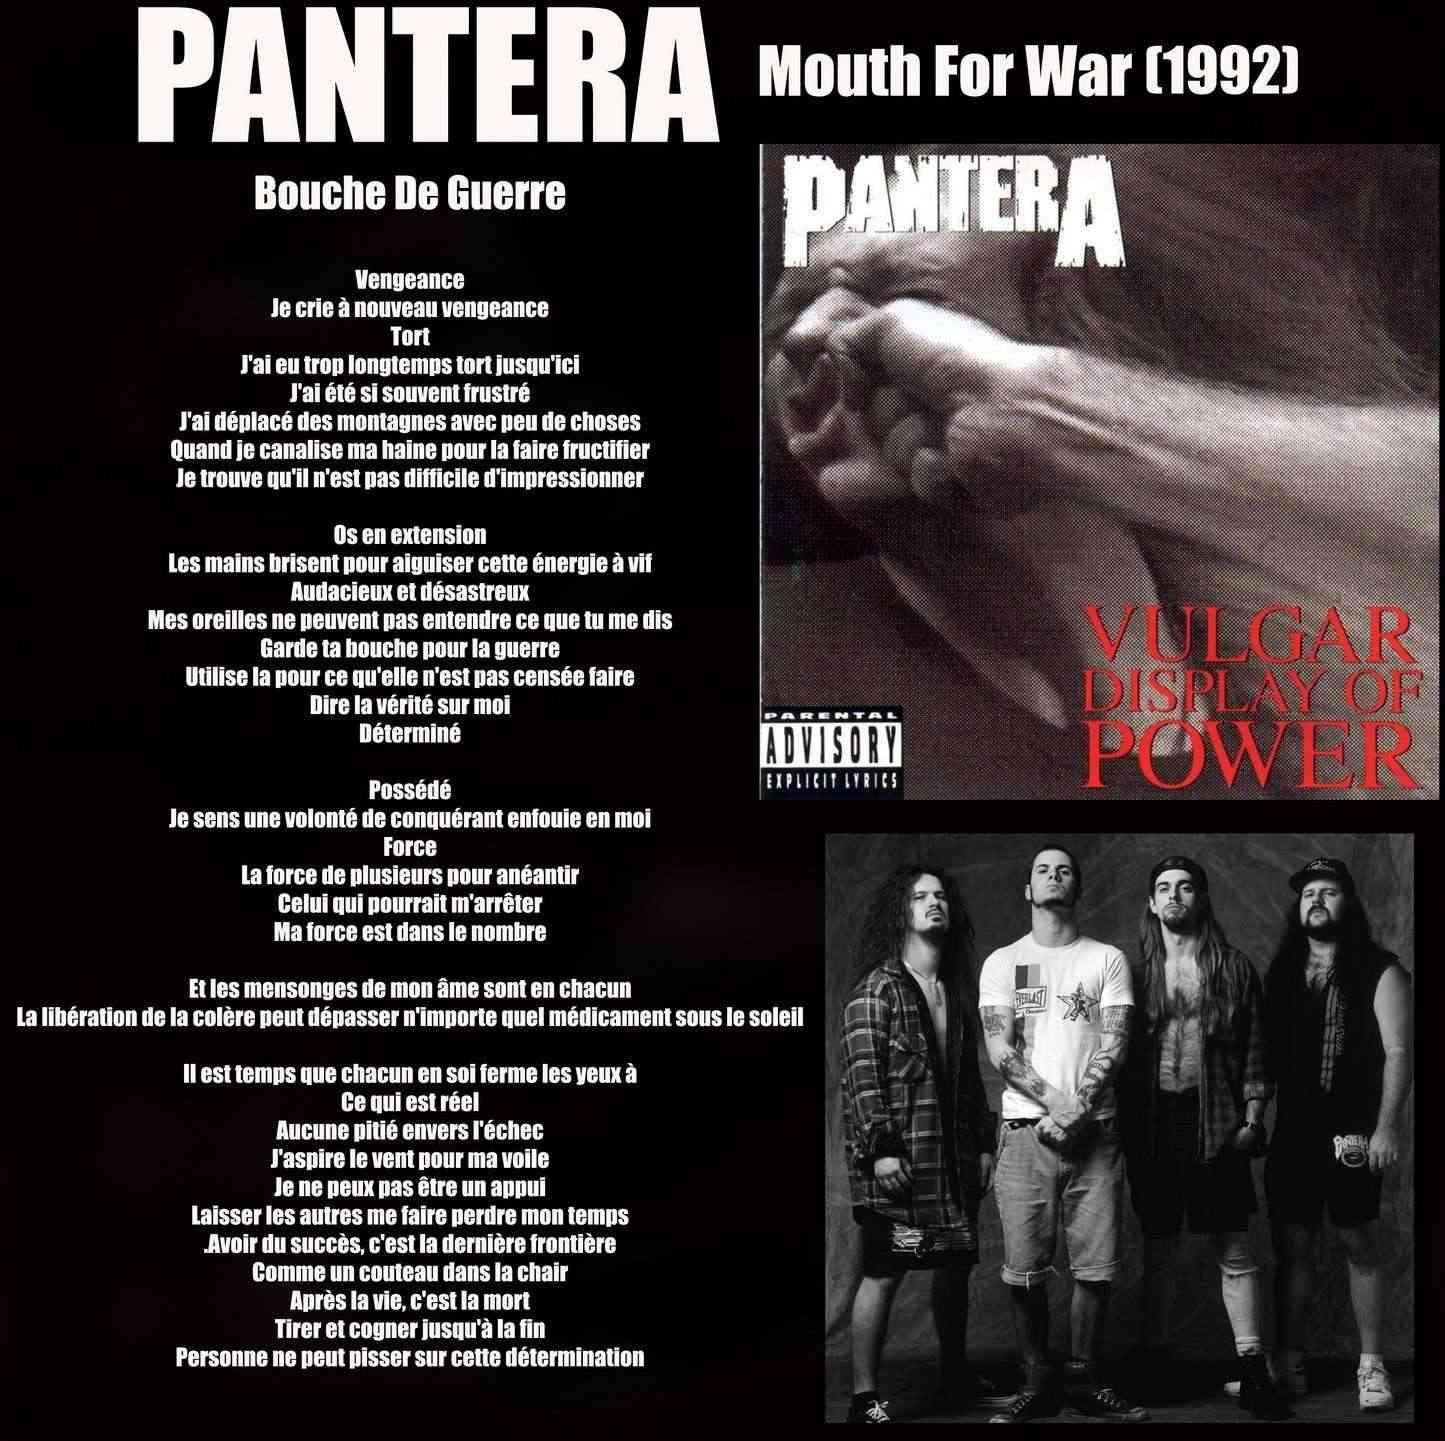 PANTERA Mouth For War (1992) Panter11